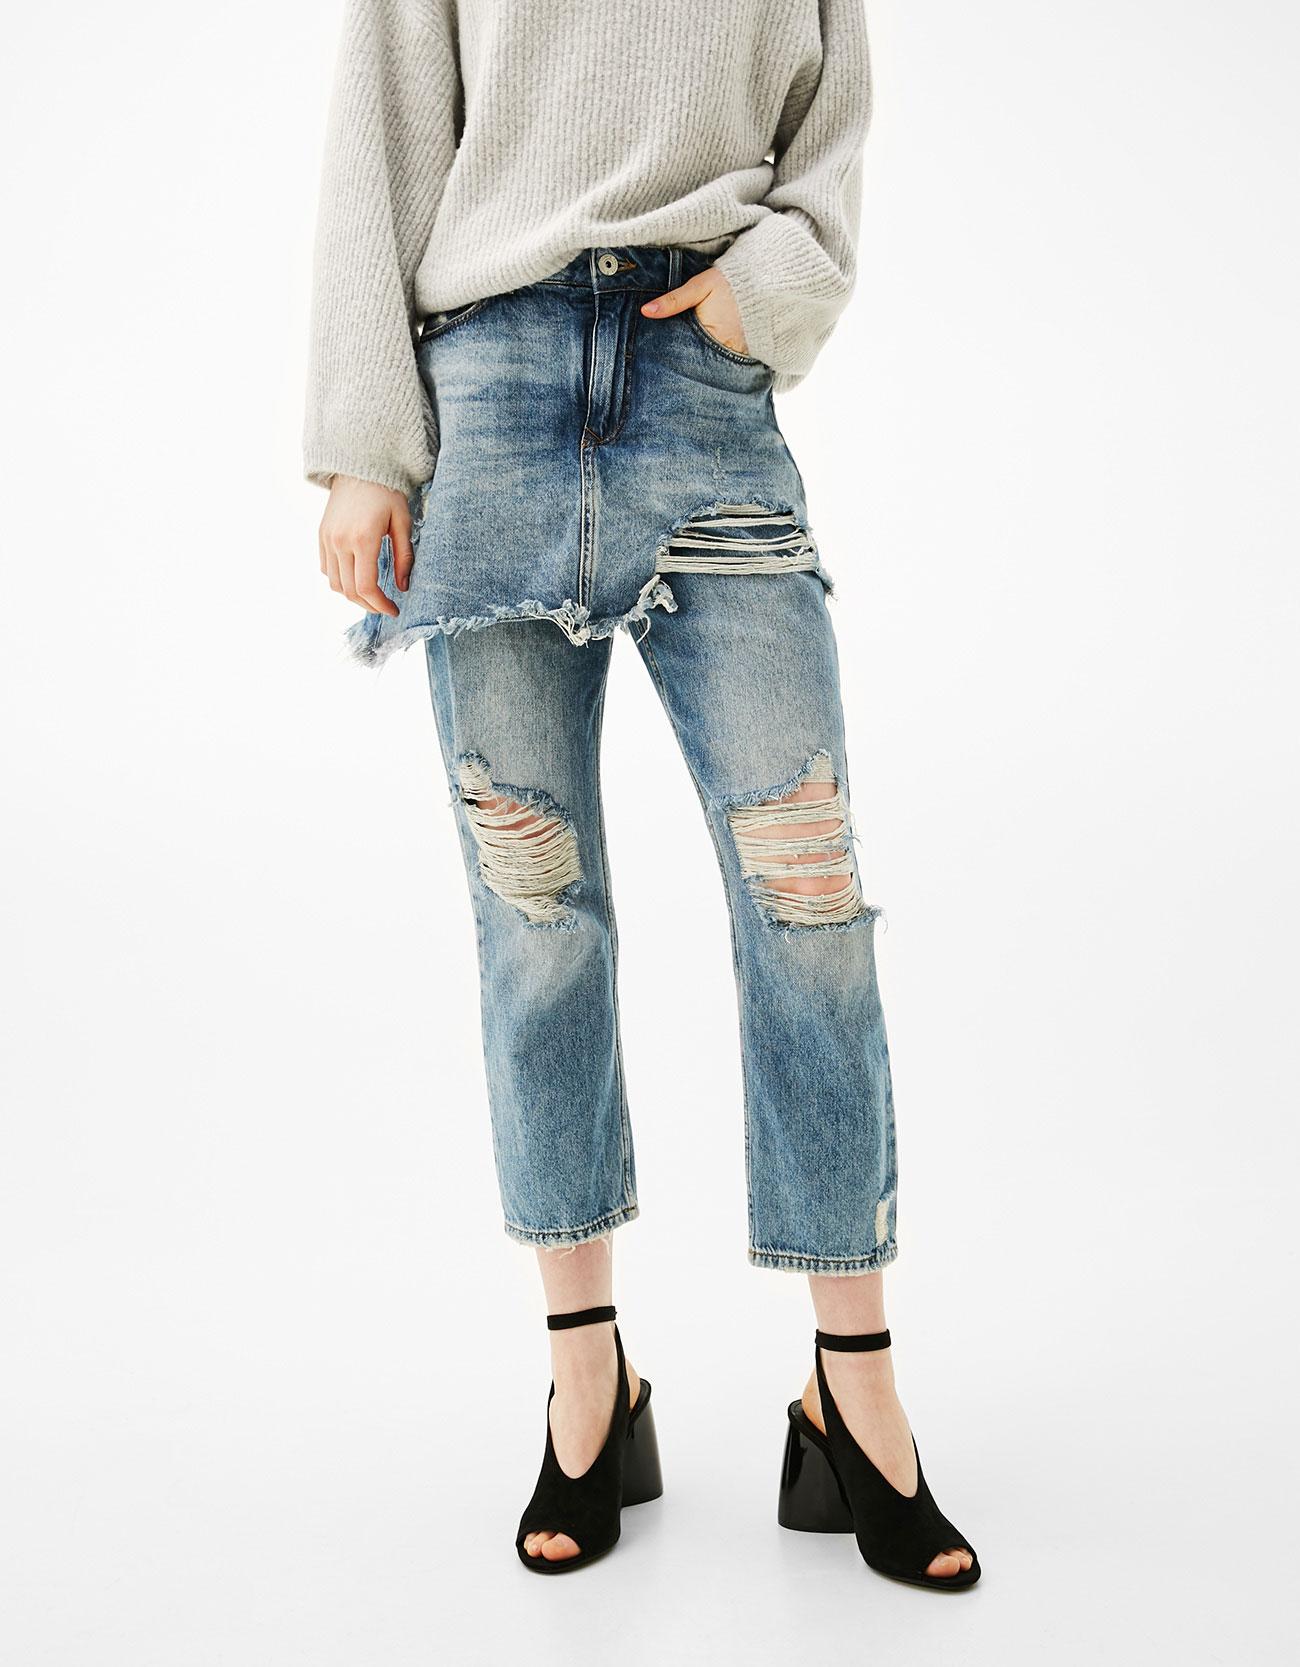 Women Pants 2017 Camouflage Jeans Mid Waist Pocket Zipper Crotch Pants American Apparel Jeans J7903